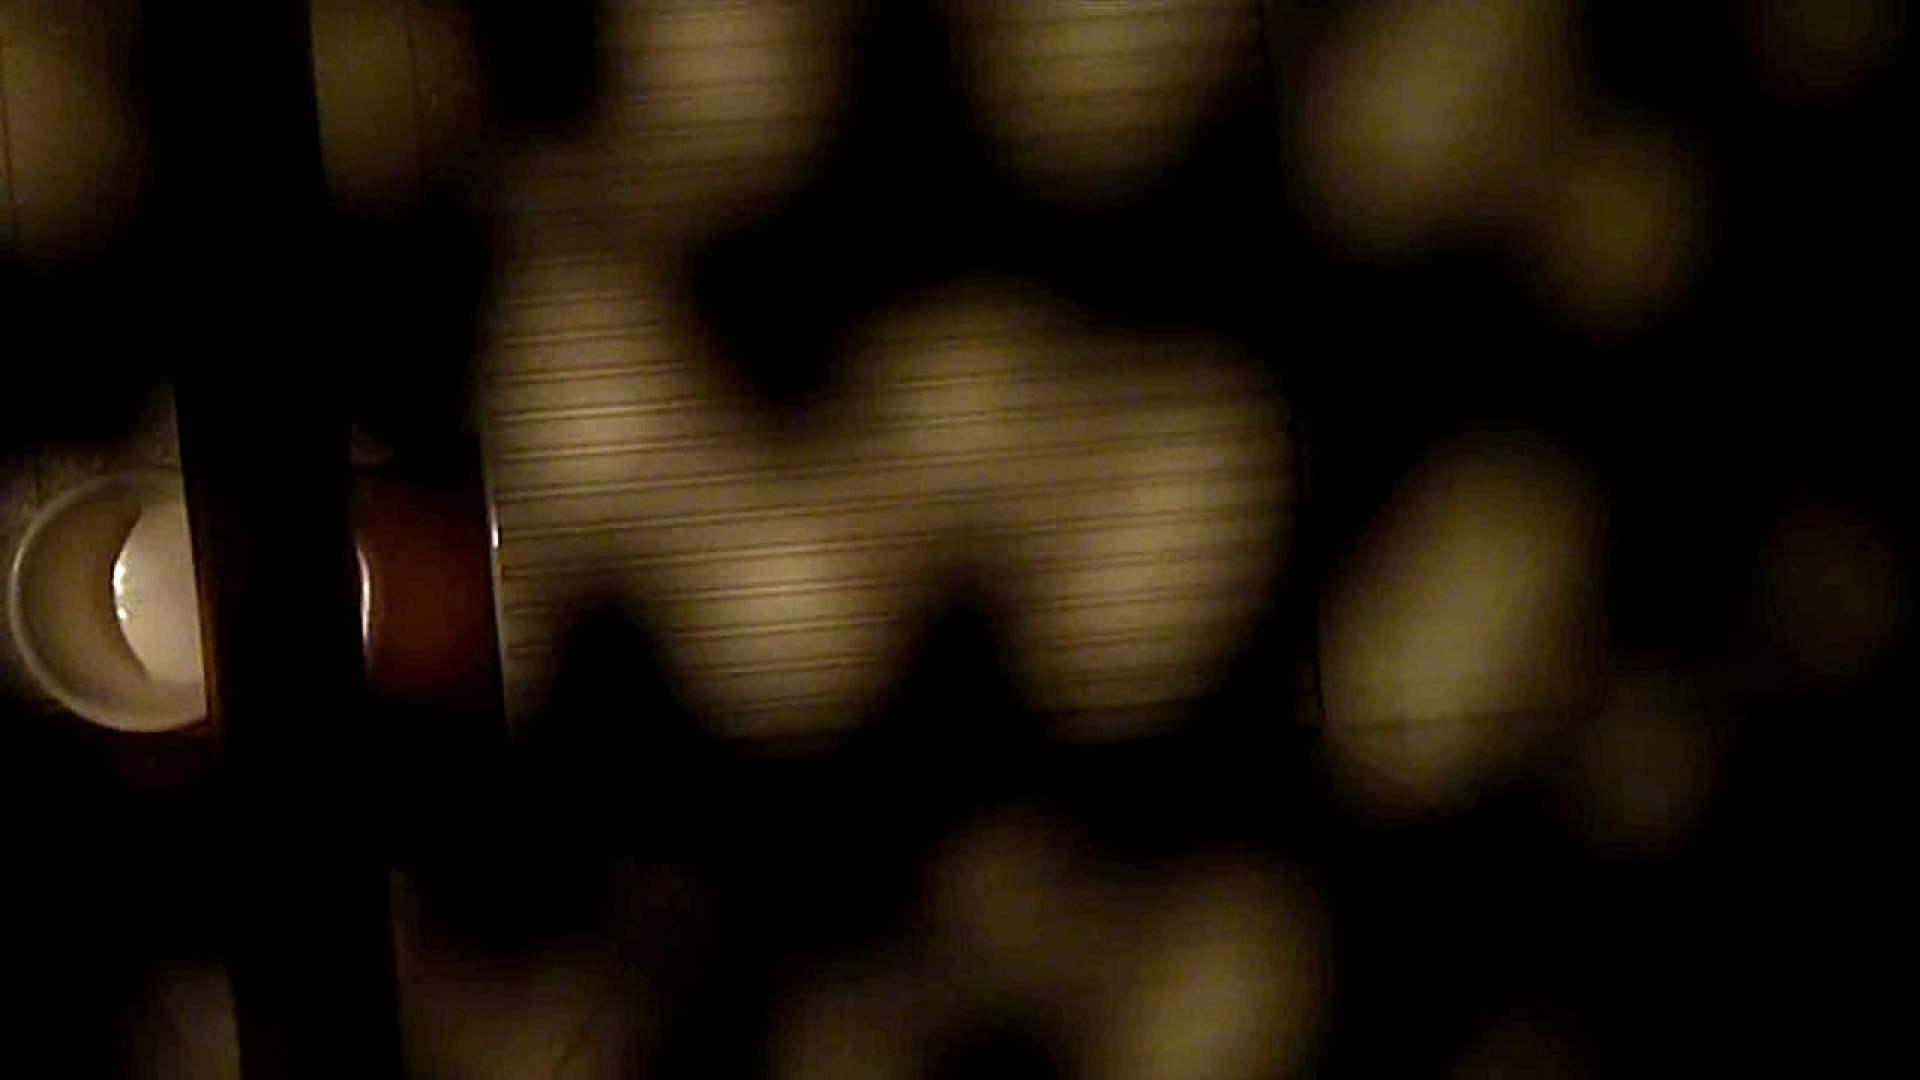 vol.1 Mayumi 窓越しに入浴シーン撮影に成功 OLの実態 | 入浴中のオンナ  17pic 13